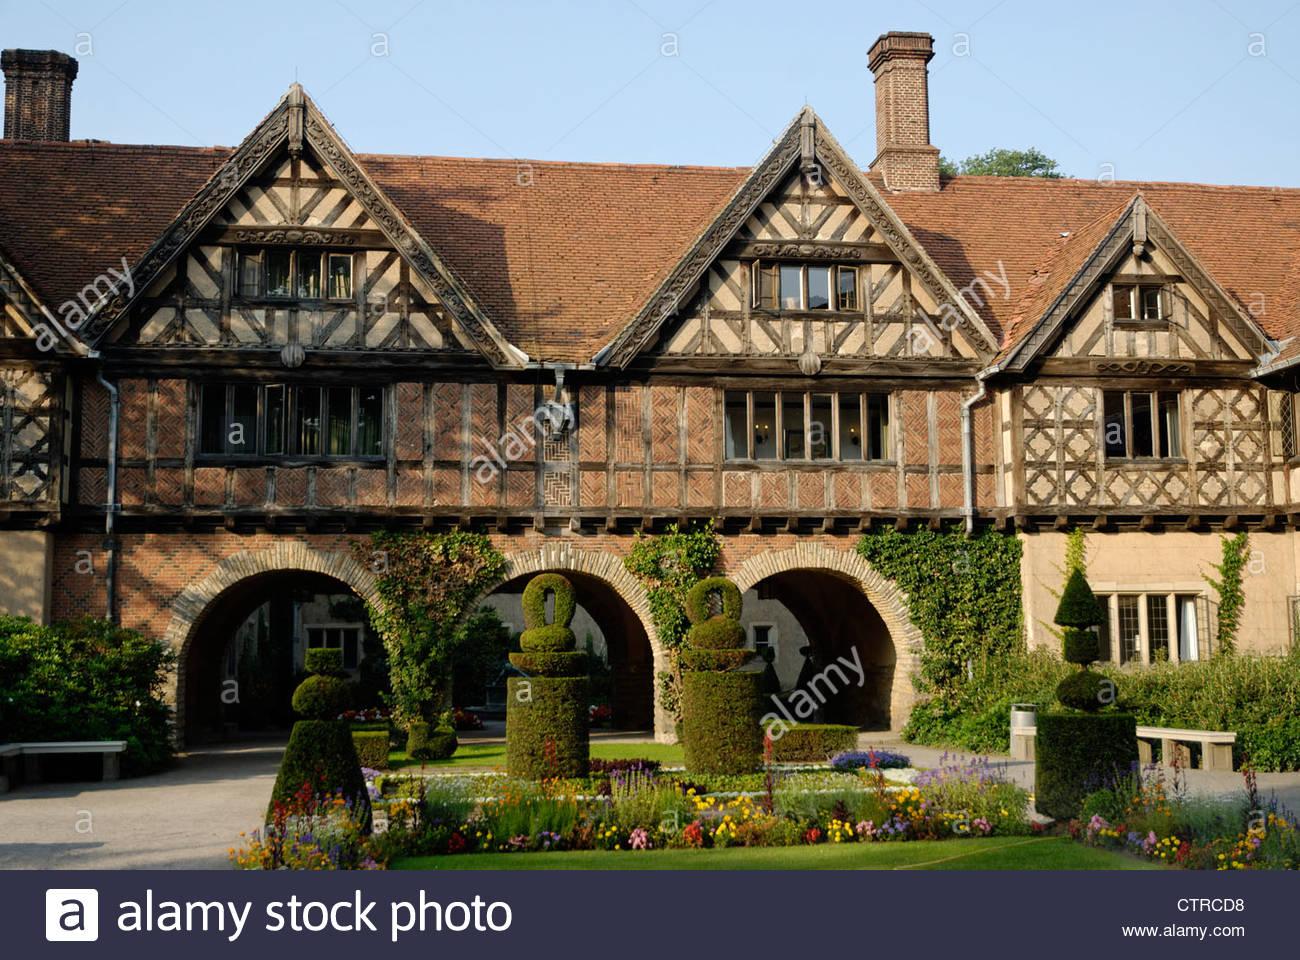 English Tudor Style Brick And Oak Timberframe Building Of